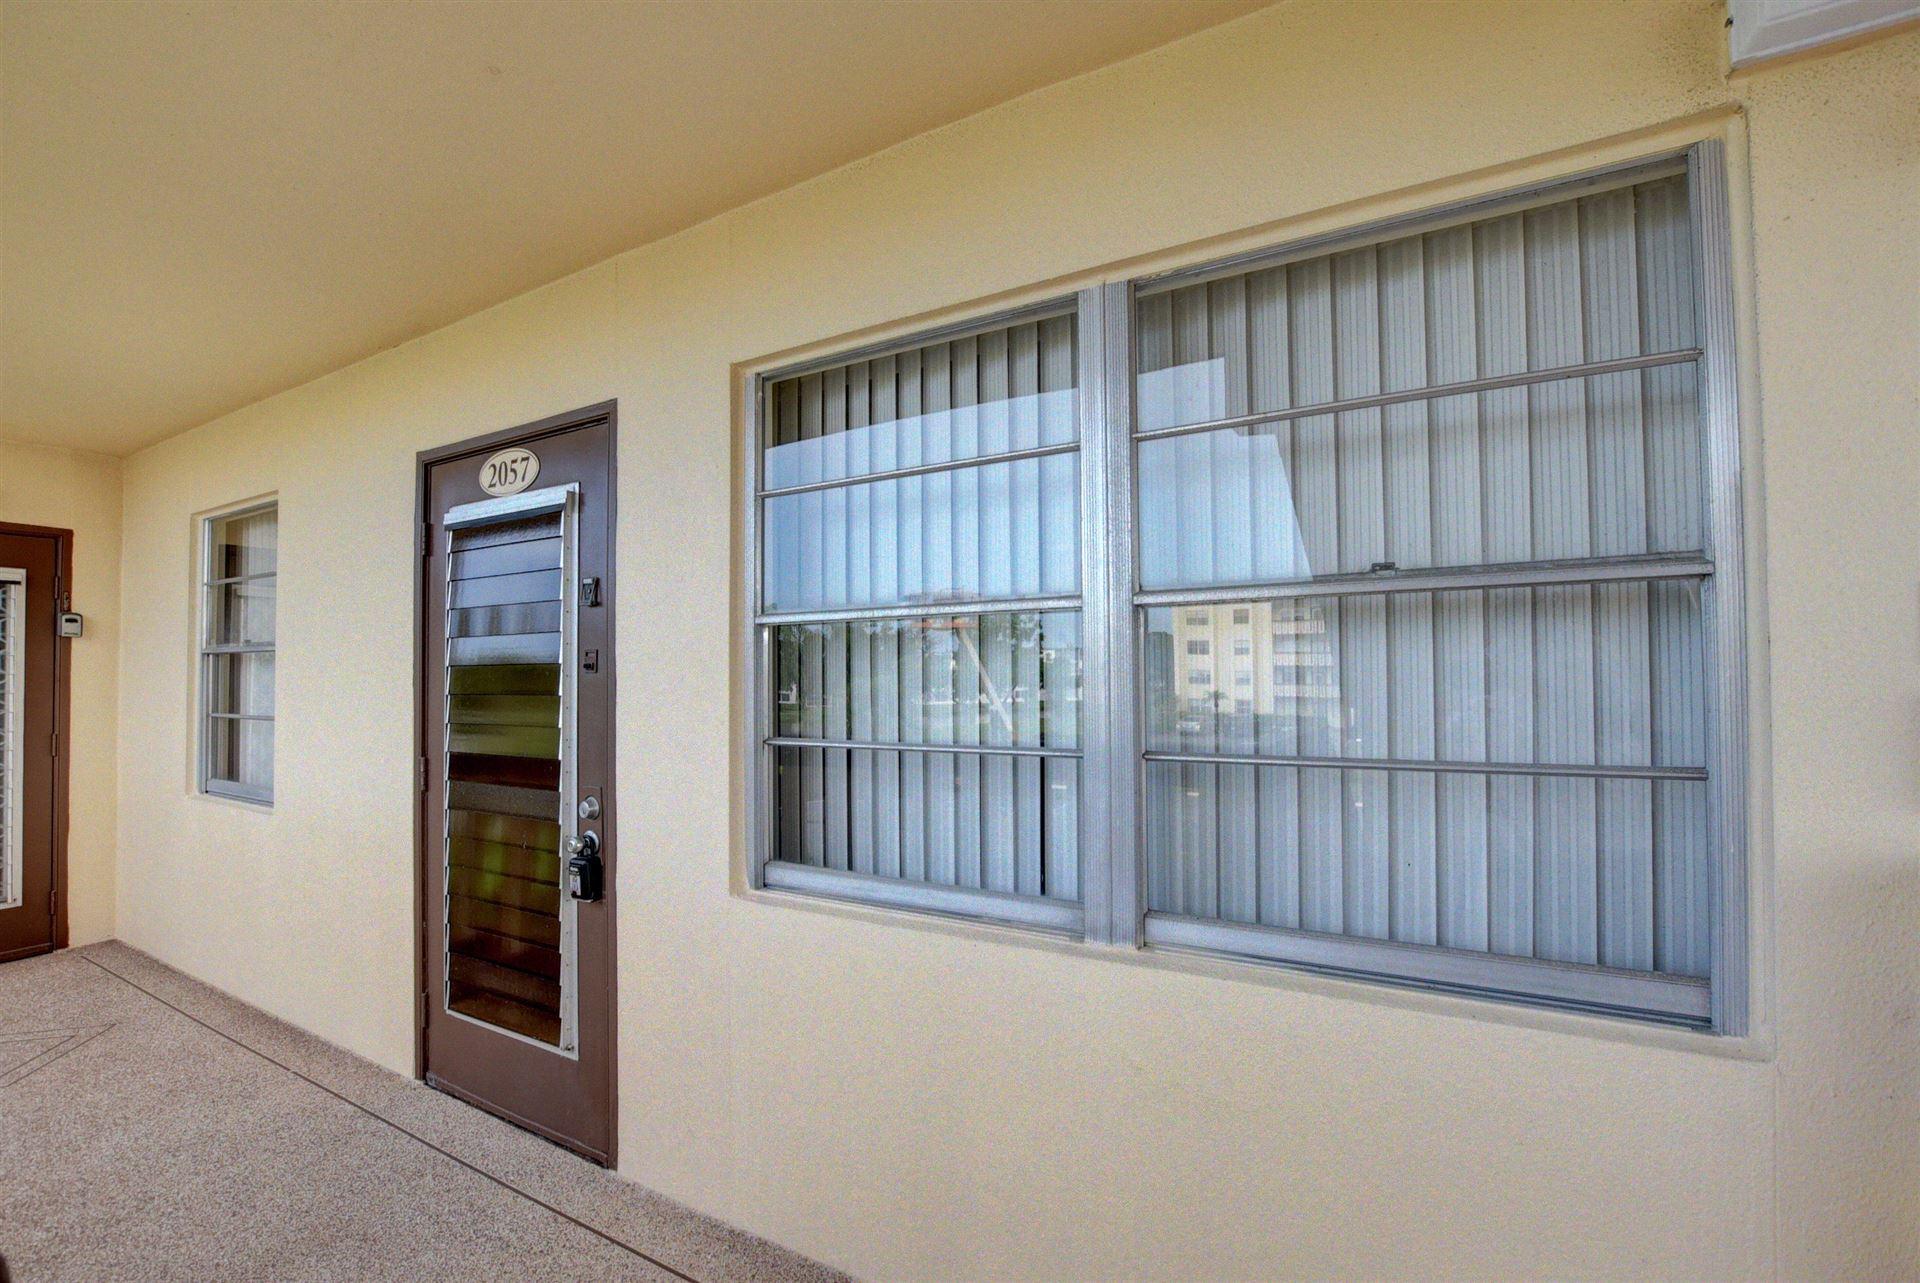 2057 Wolverton C, Boca Raton, FL 33434 - MLS#: RX-10636879